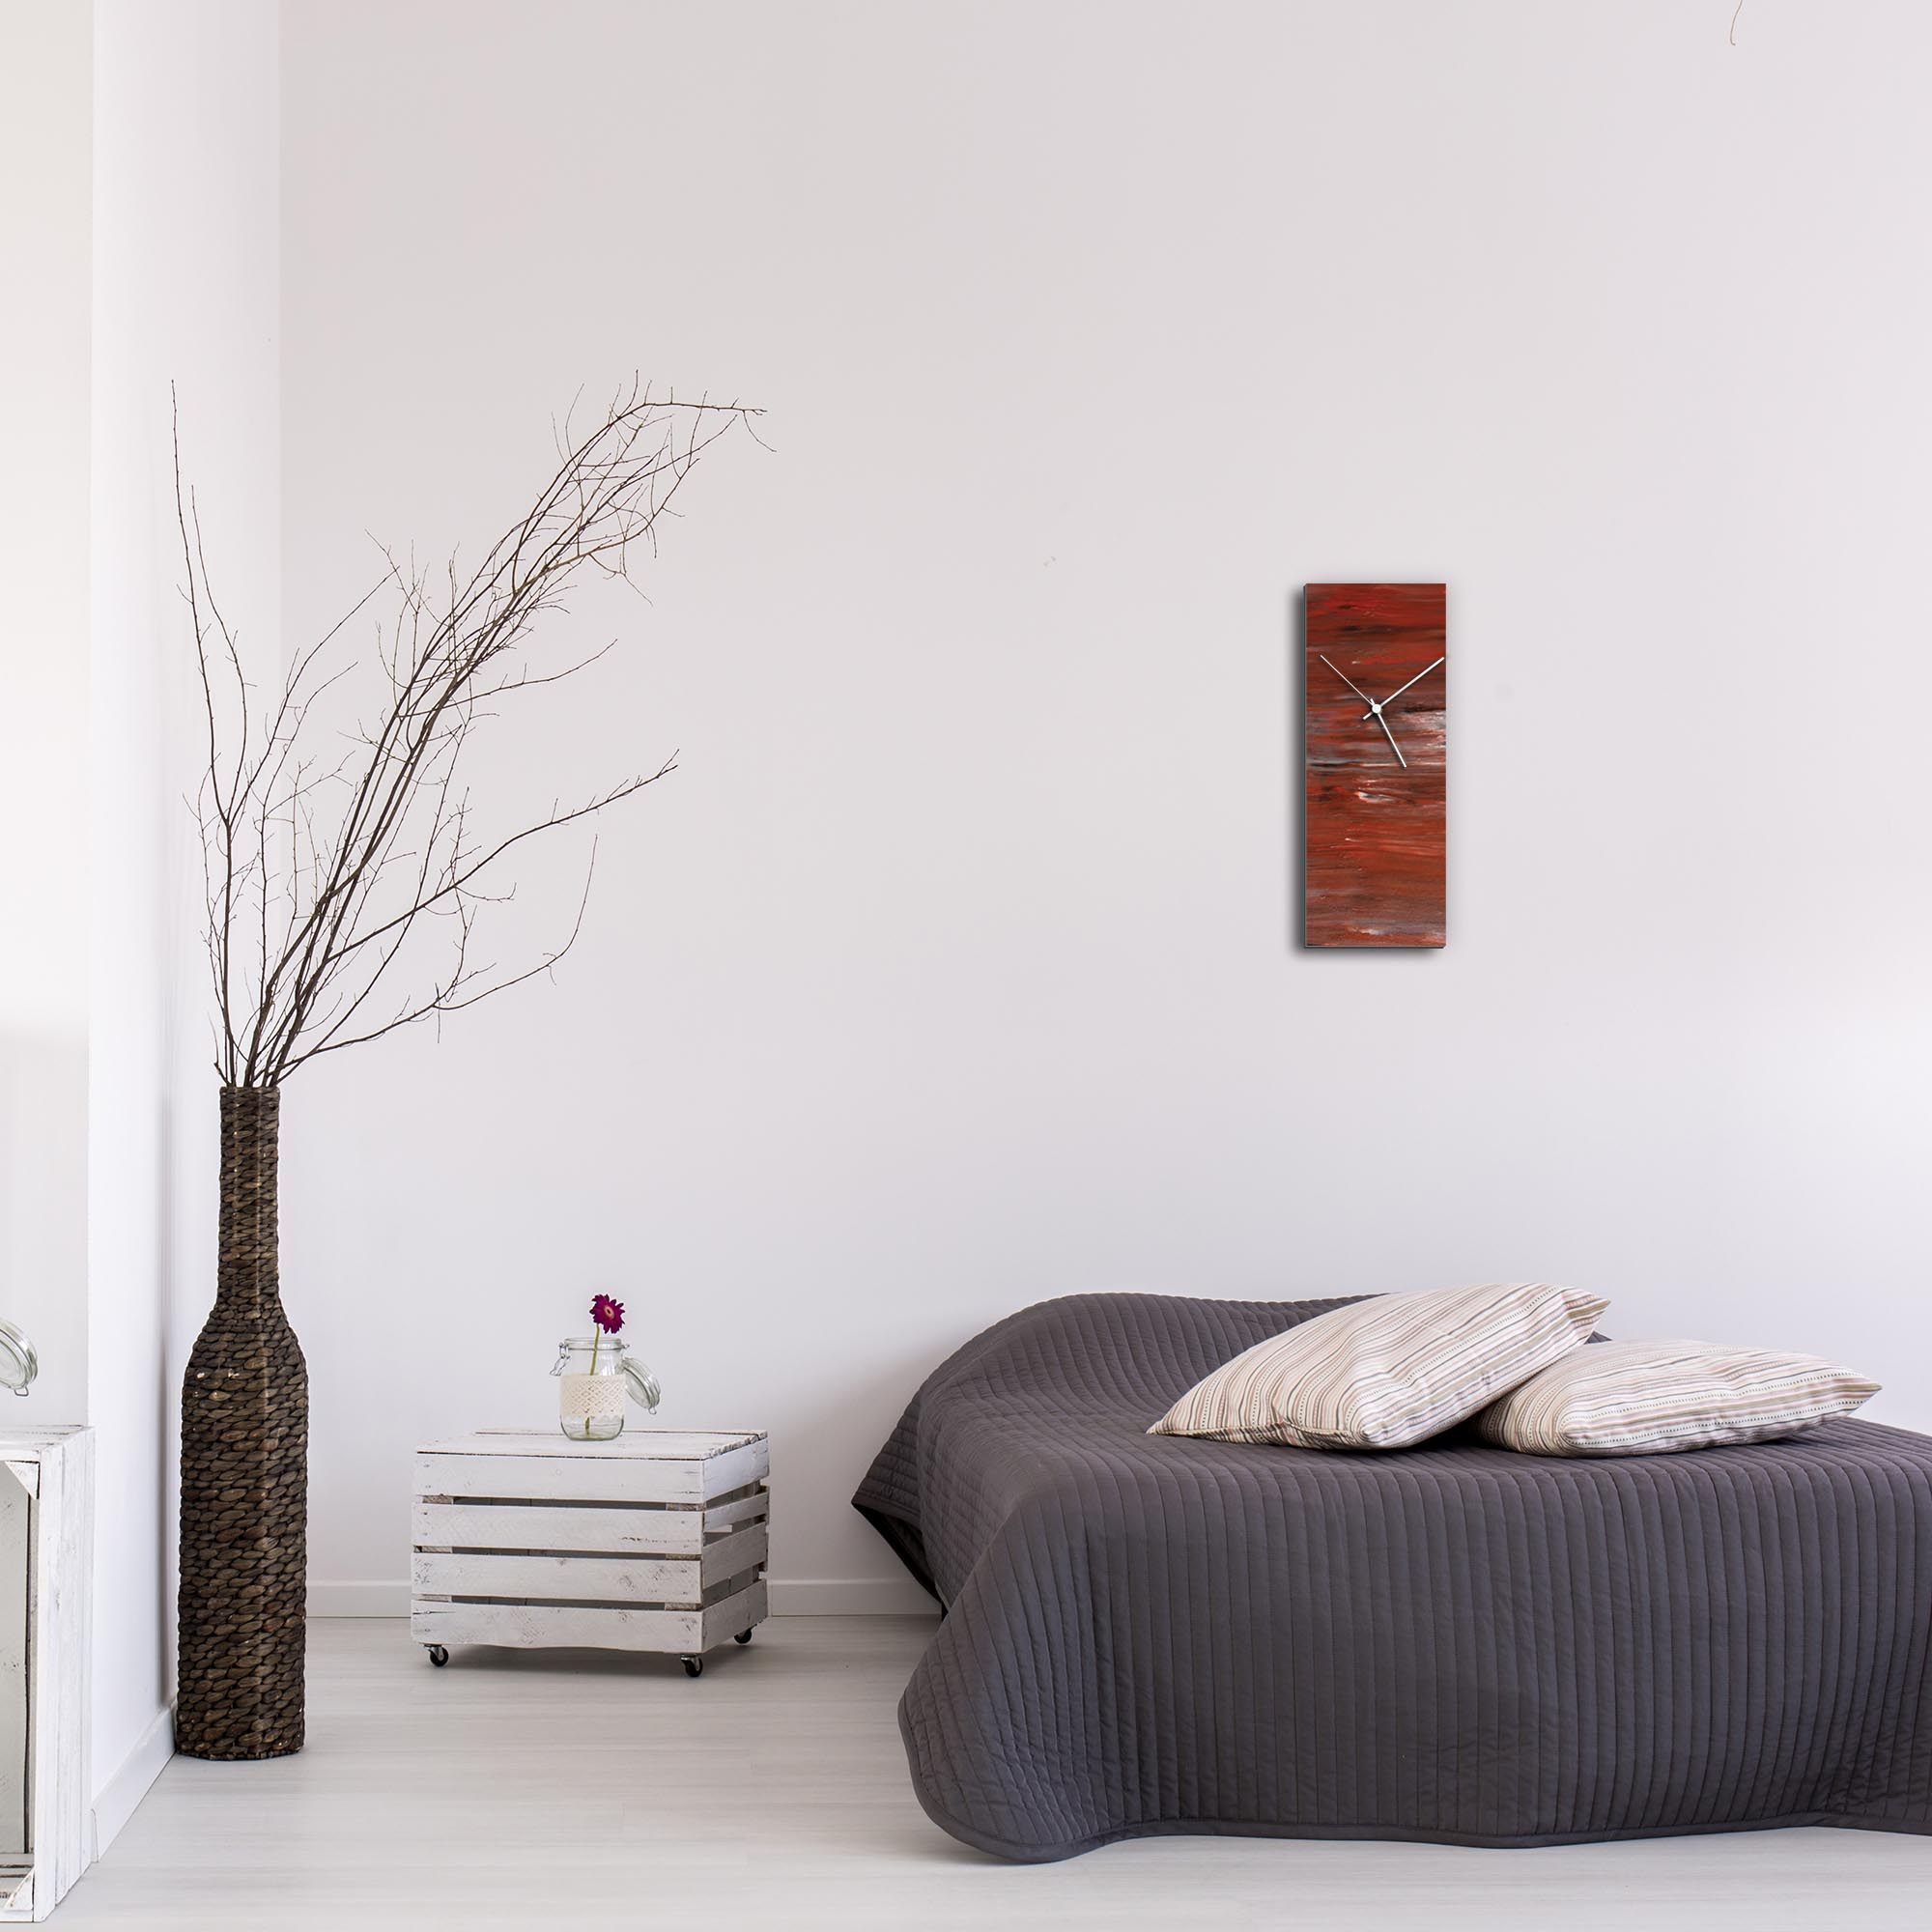 City Brick Clock by Mendo Vasilevski - Urban Abstract Home Decor - Lifestyle View